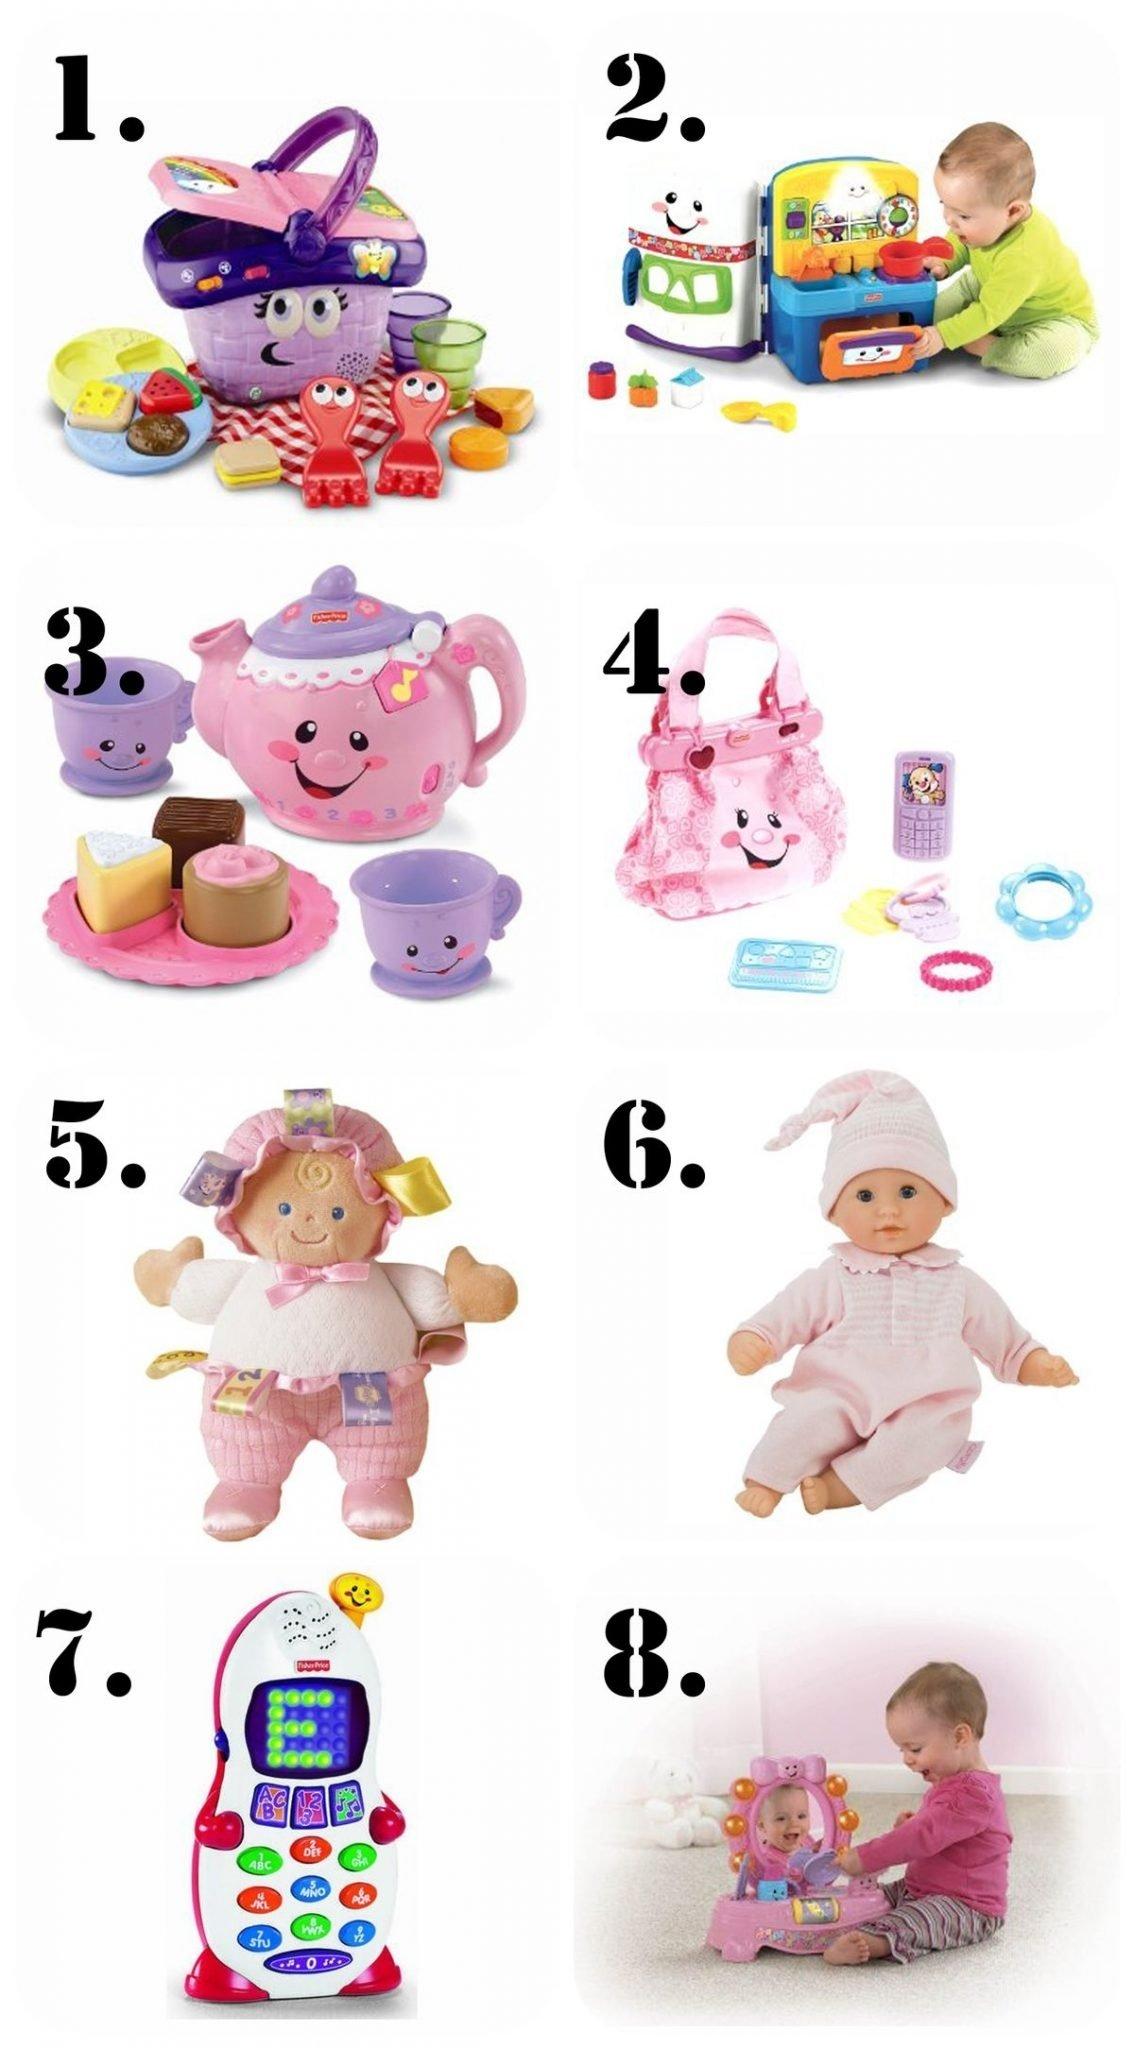 10 Lovable 5 Yr Old Girl Birthday Gift Ideas themes birthday 6 yr old girl birthday present ideas also birthday 2021